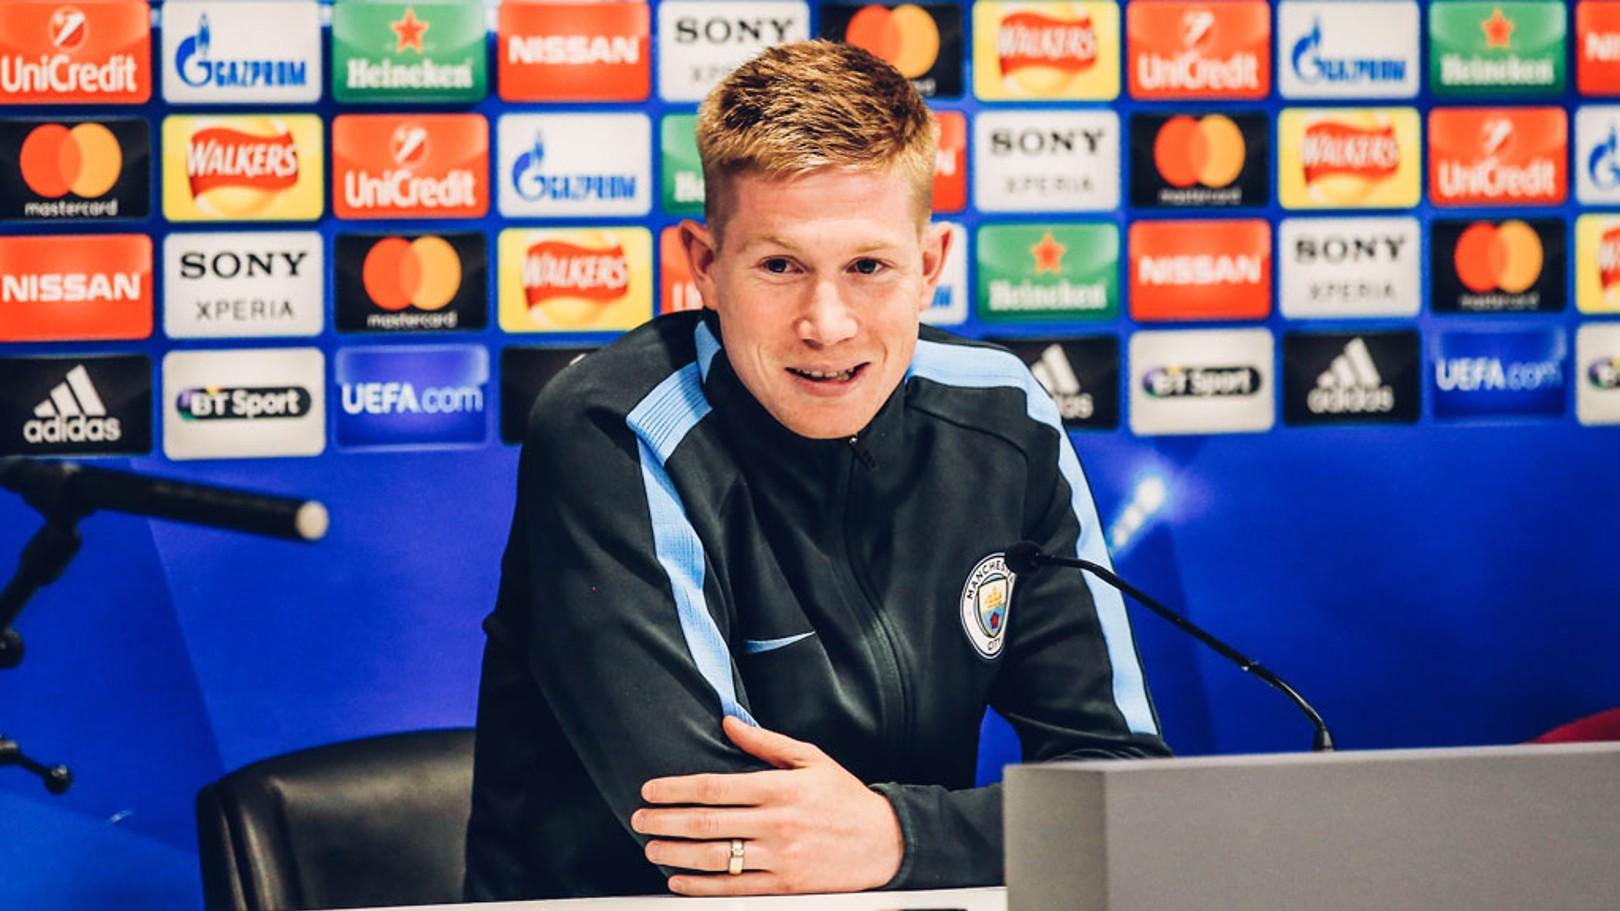 KDB: De Bruyne speaks ahead of City's Champions League clash.